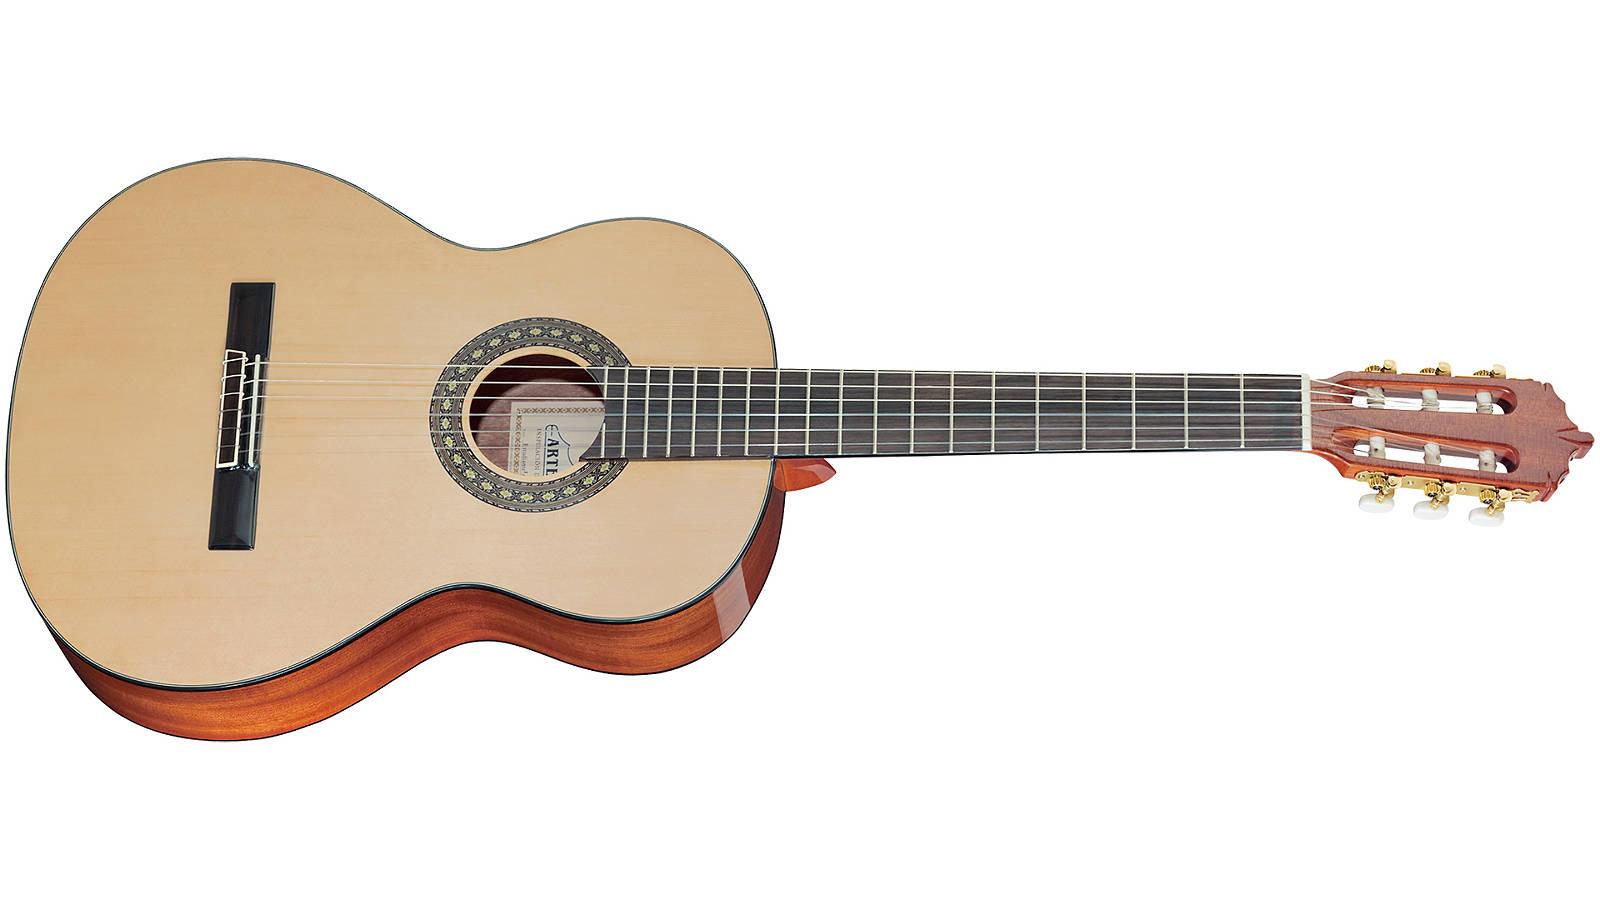 Artesano Estudiante XA Konzertgitarre 4/4